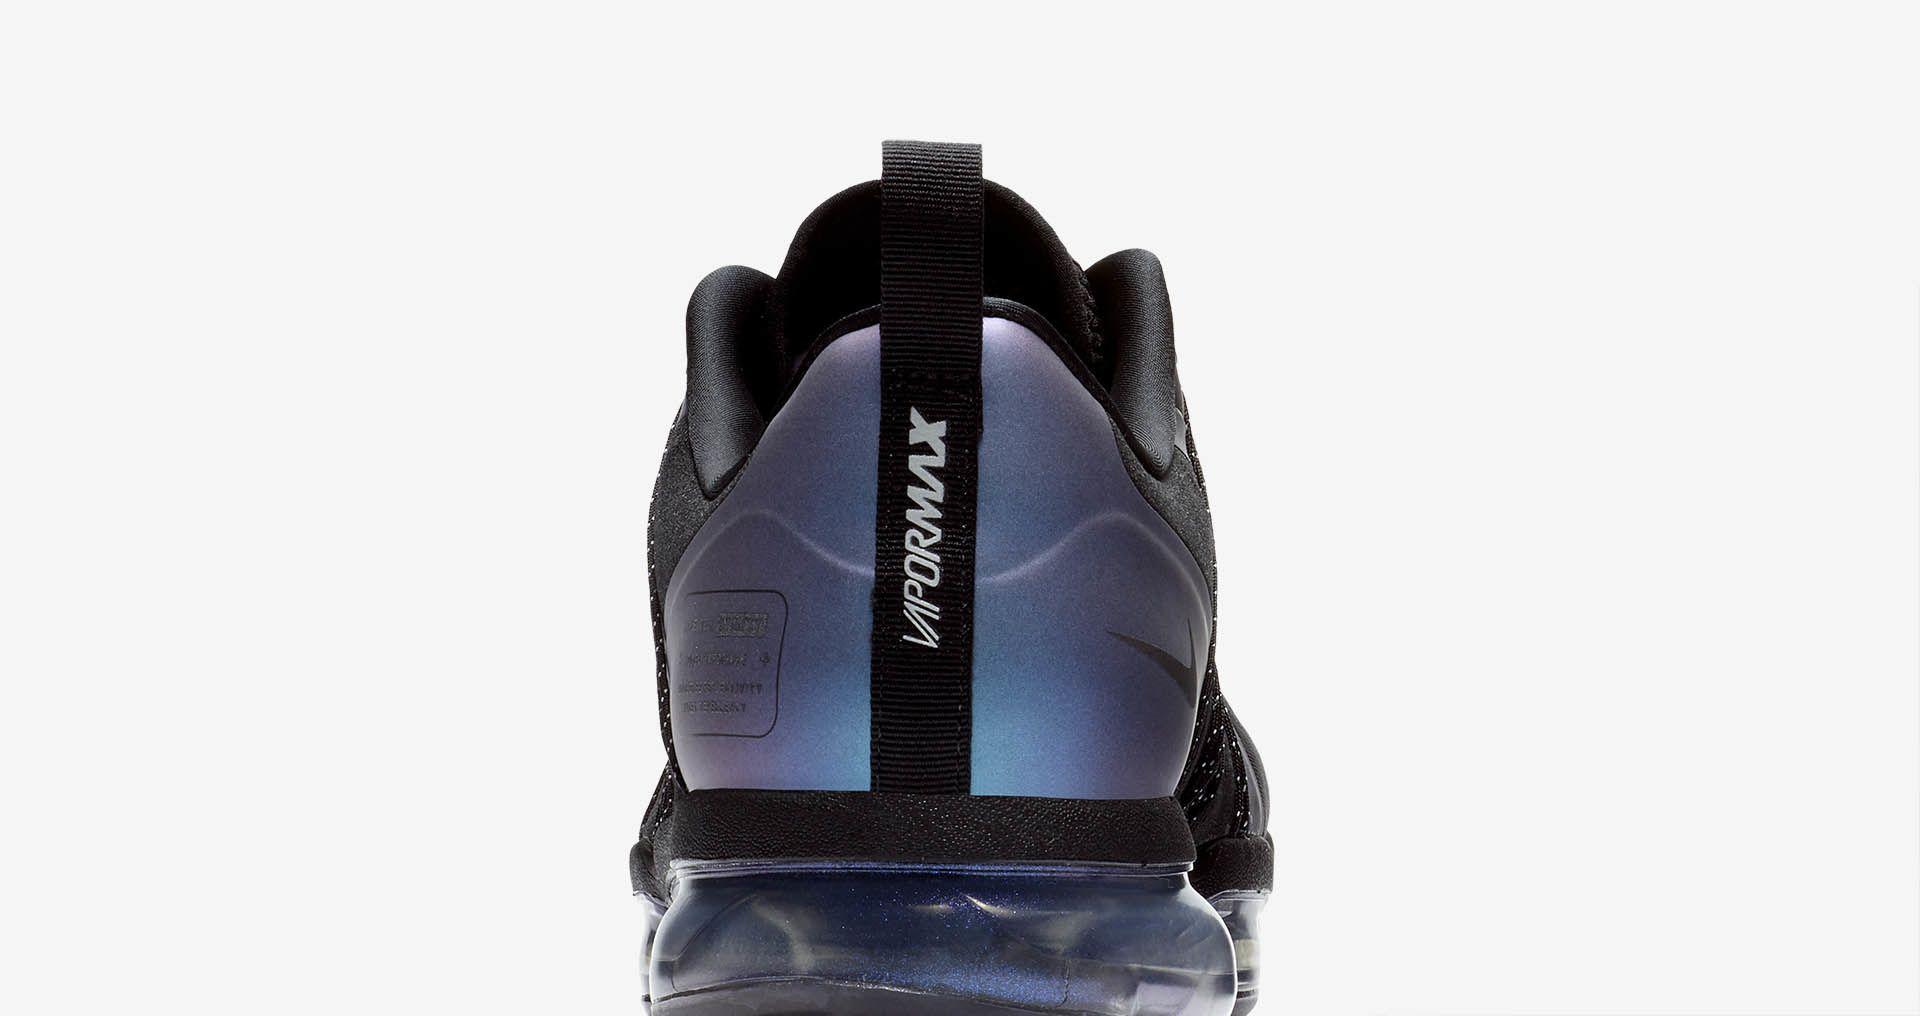 d8721593e7d0 Air VaporMax Run Utility  Throwback Future  Release Date. Nike+ SNKRS